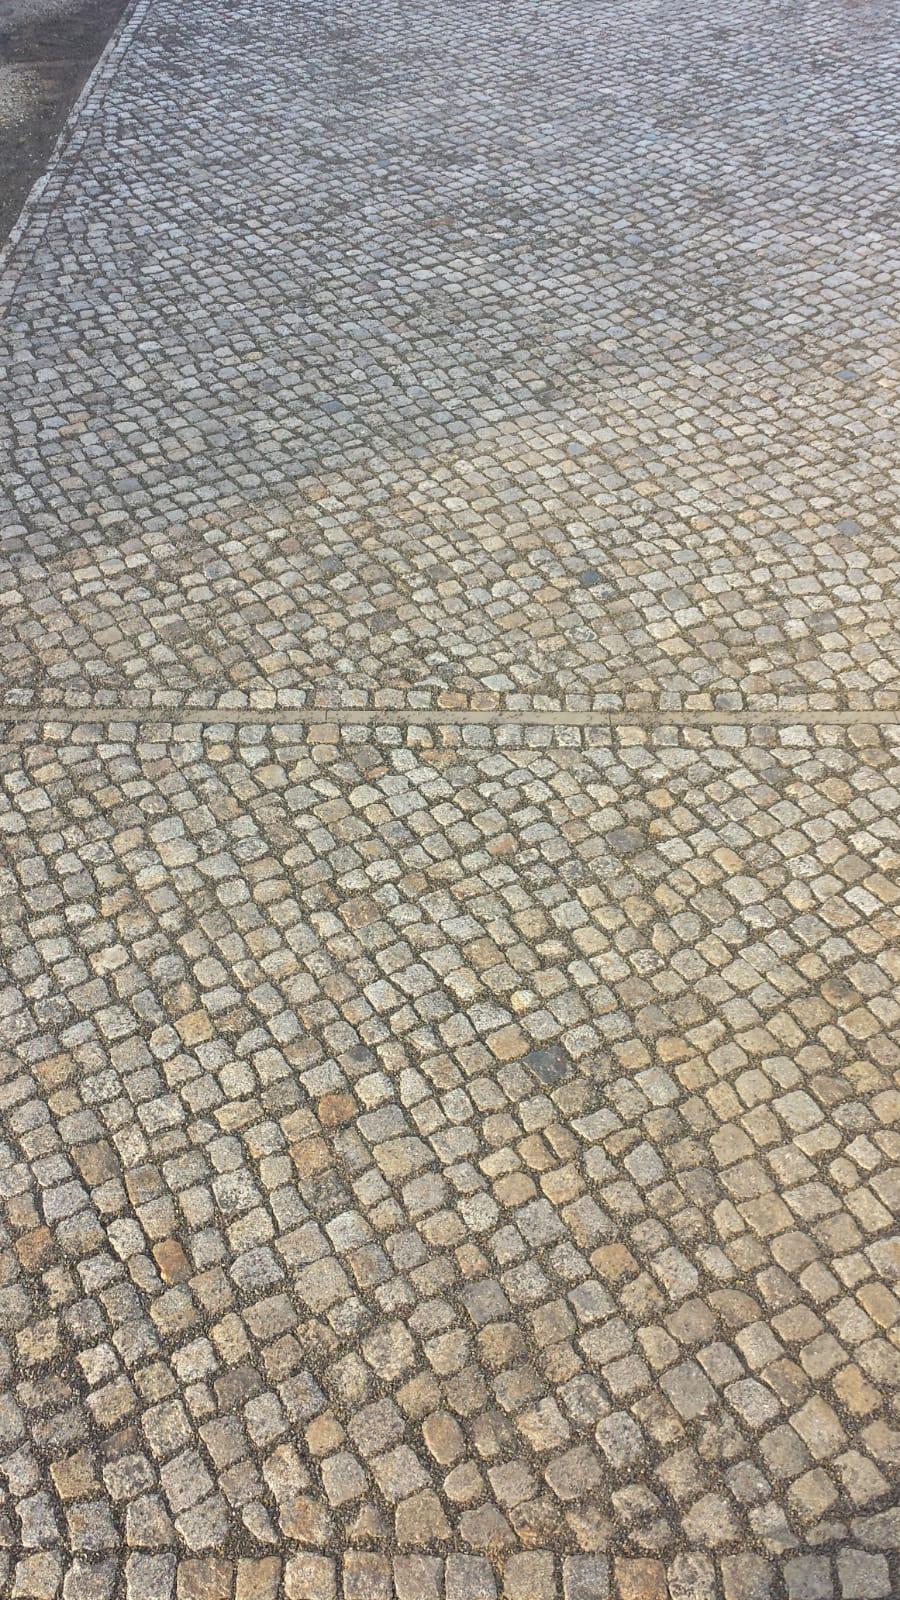 granit-kleinpflaster-box14a-gebraucht-grau